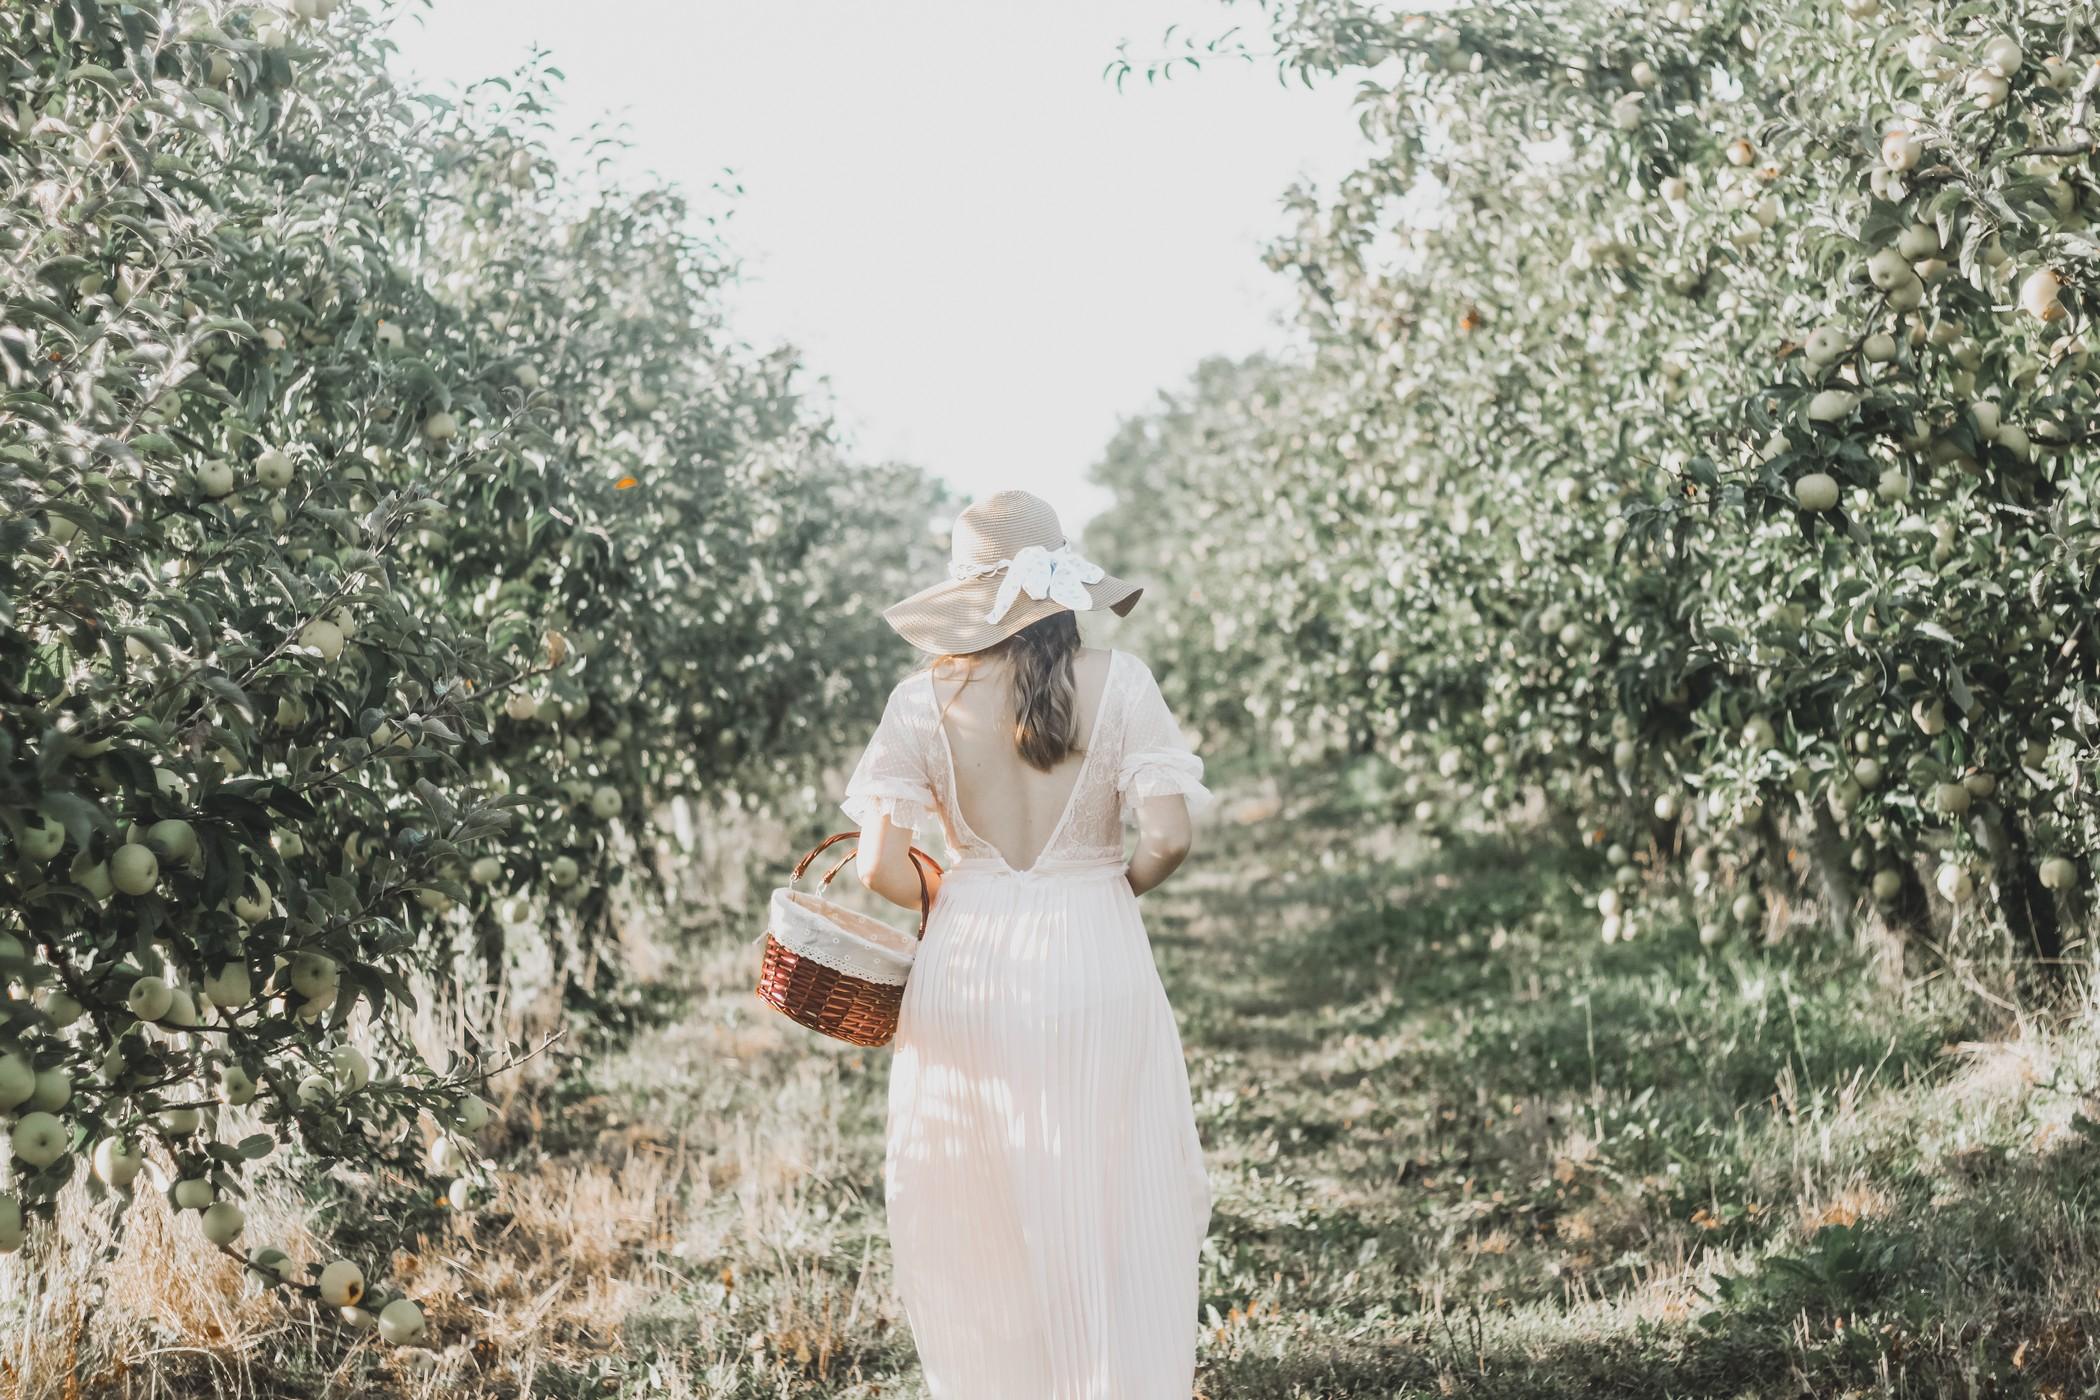 Nude long dress and apple tree